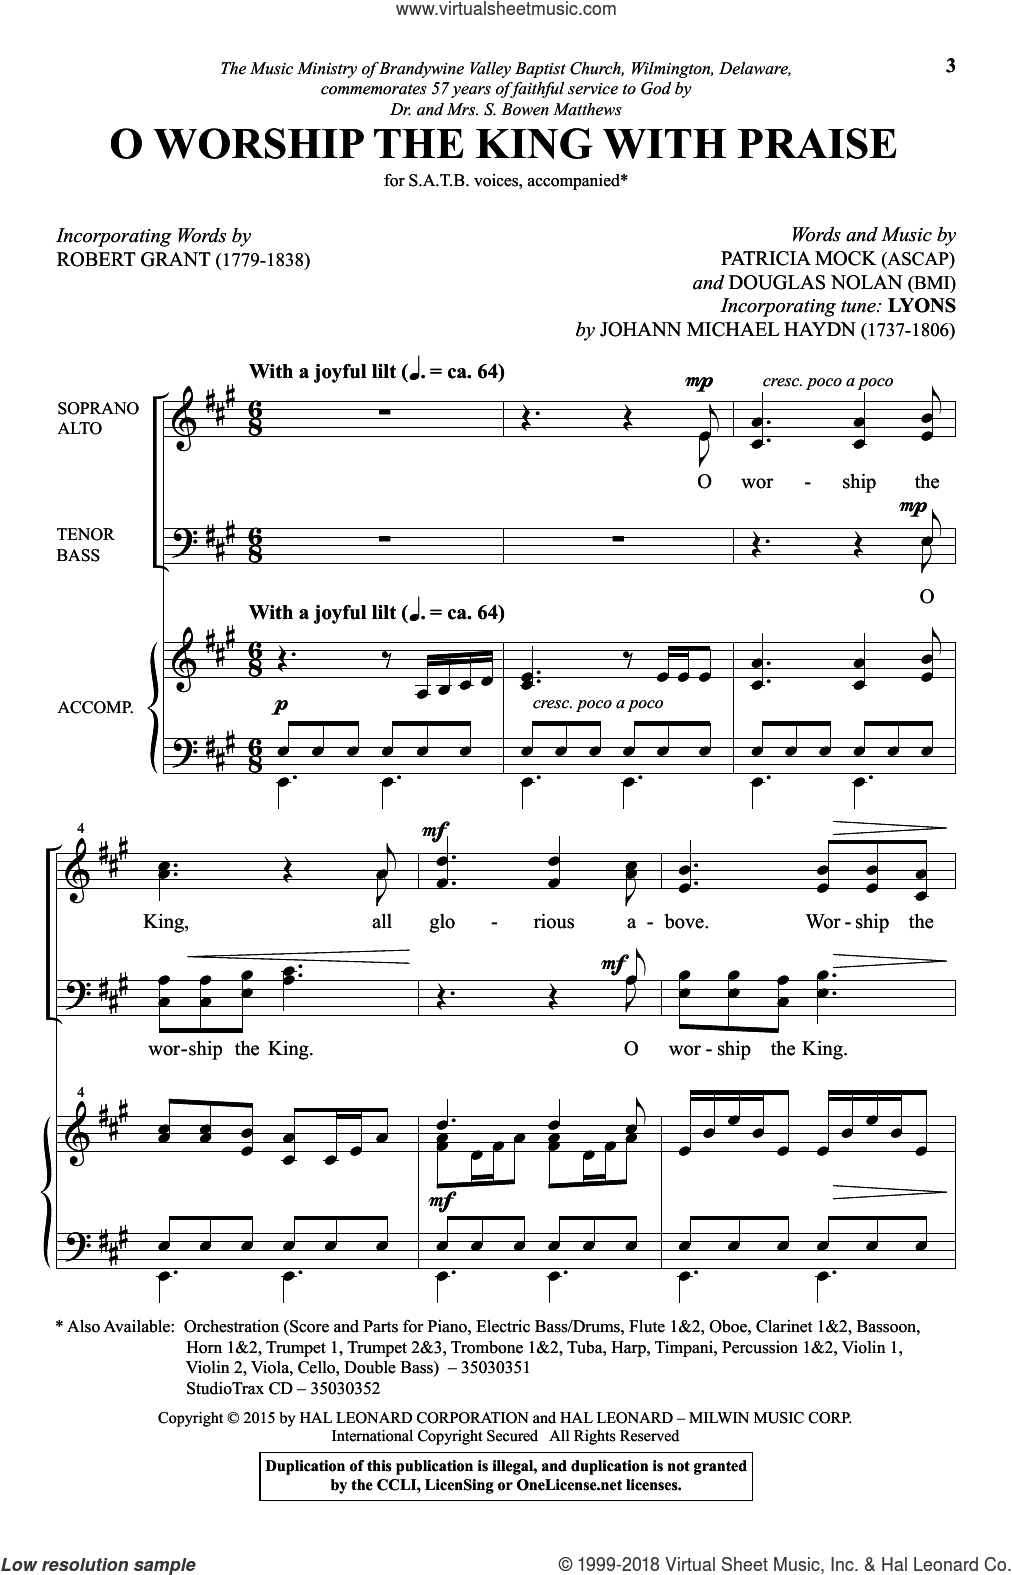 O Worship The King With Praise sheet music for choir (SATB: soprano, alto, tenor, bass) by Douglas Nolan and Patricia Mock, intermediate skill level